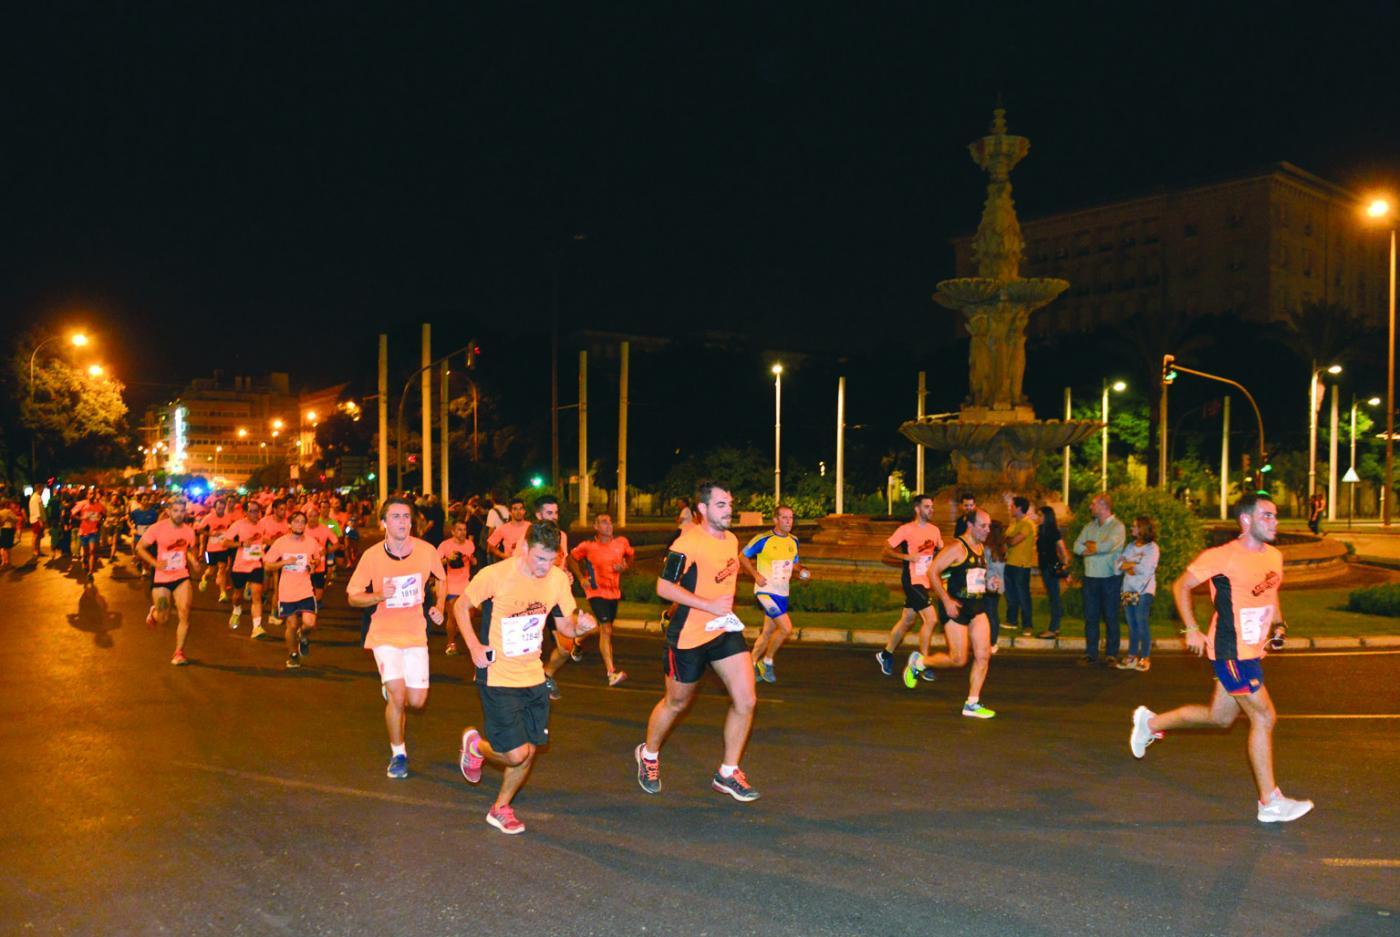 La Nocturna del Guadalquivir, la primera gran cita